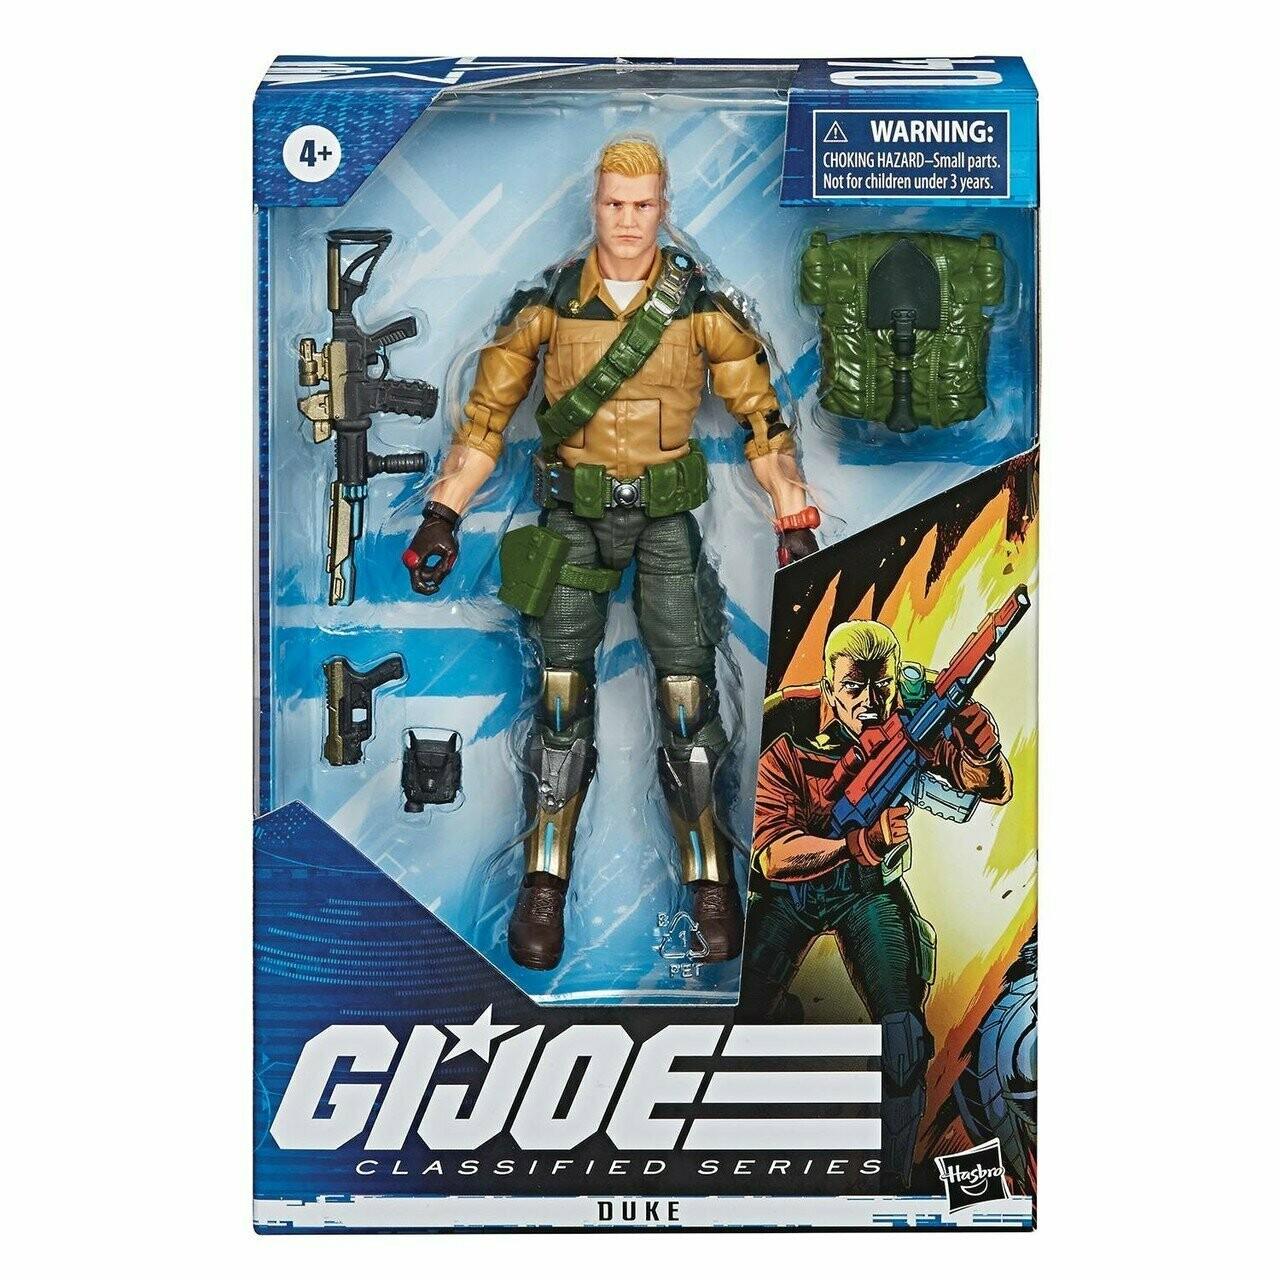 G.I.Joe Classified Series Duke